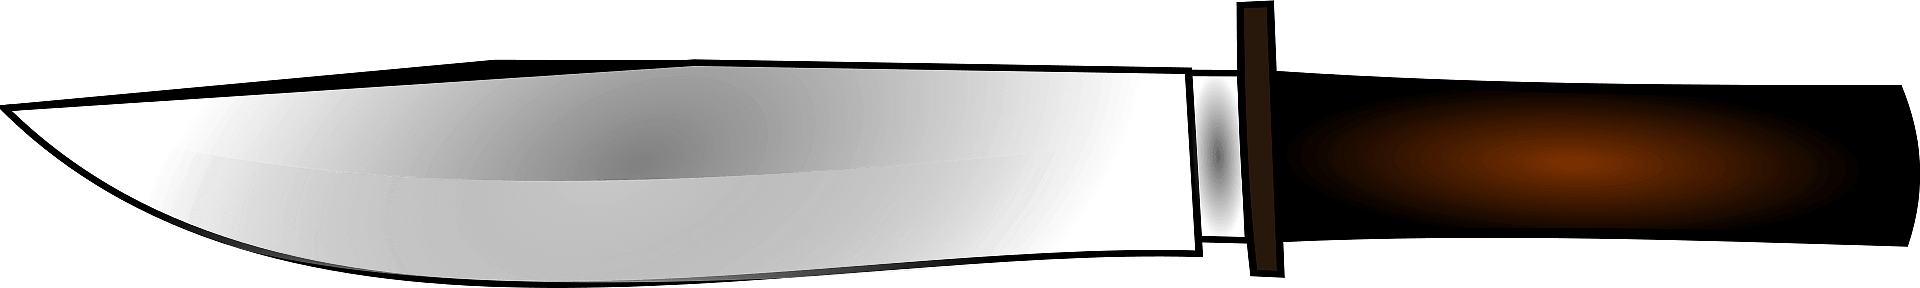 Knife clipart transparent 2